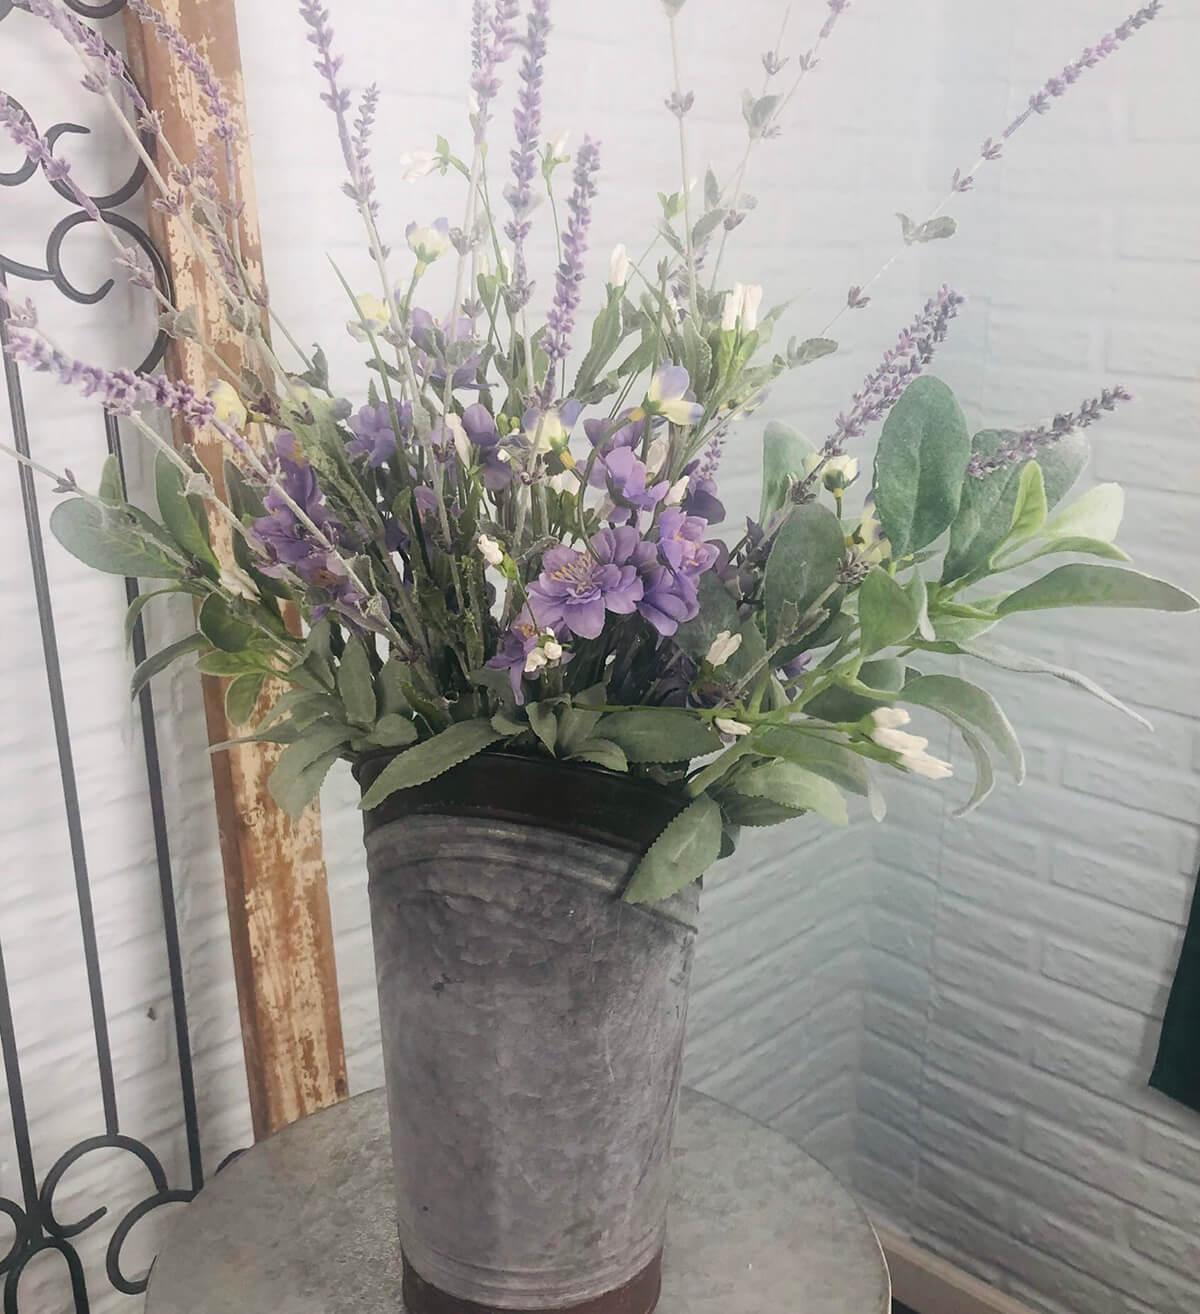 A Rustic Lavender Tabletop Arrangement